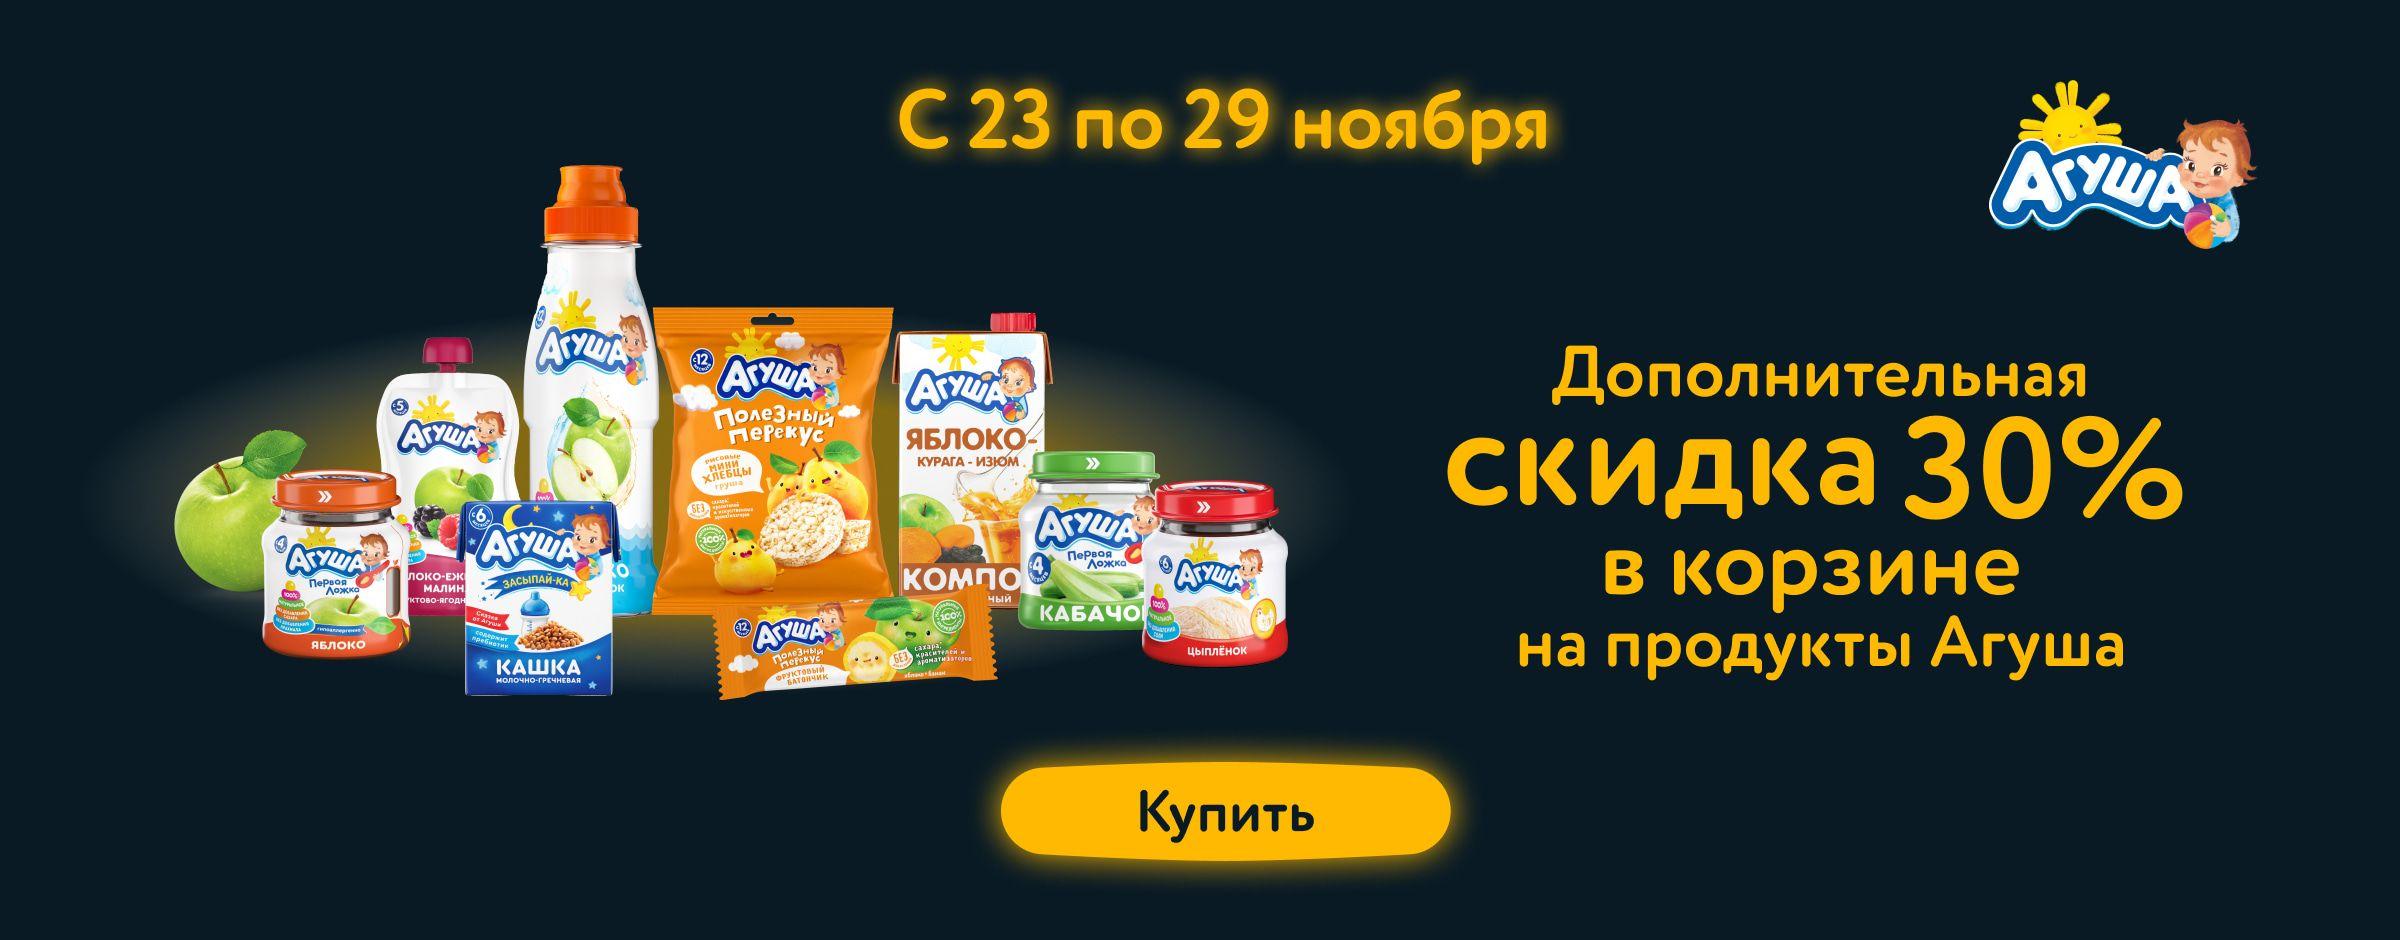 30% на питание Агуша в корзине